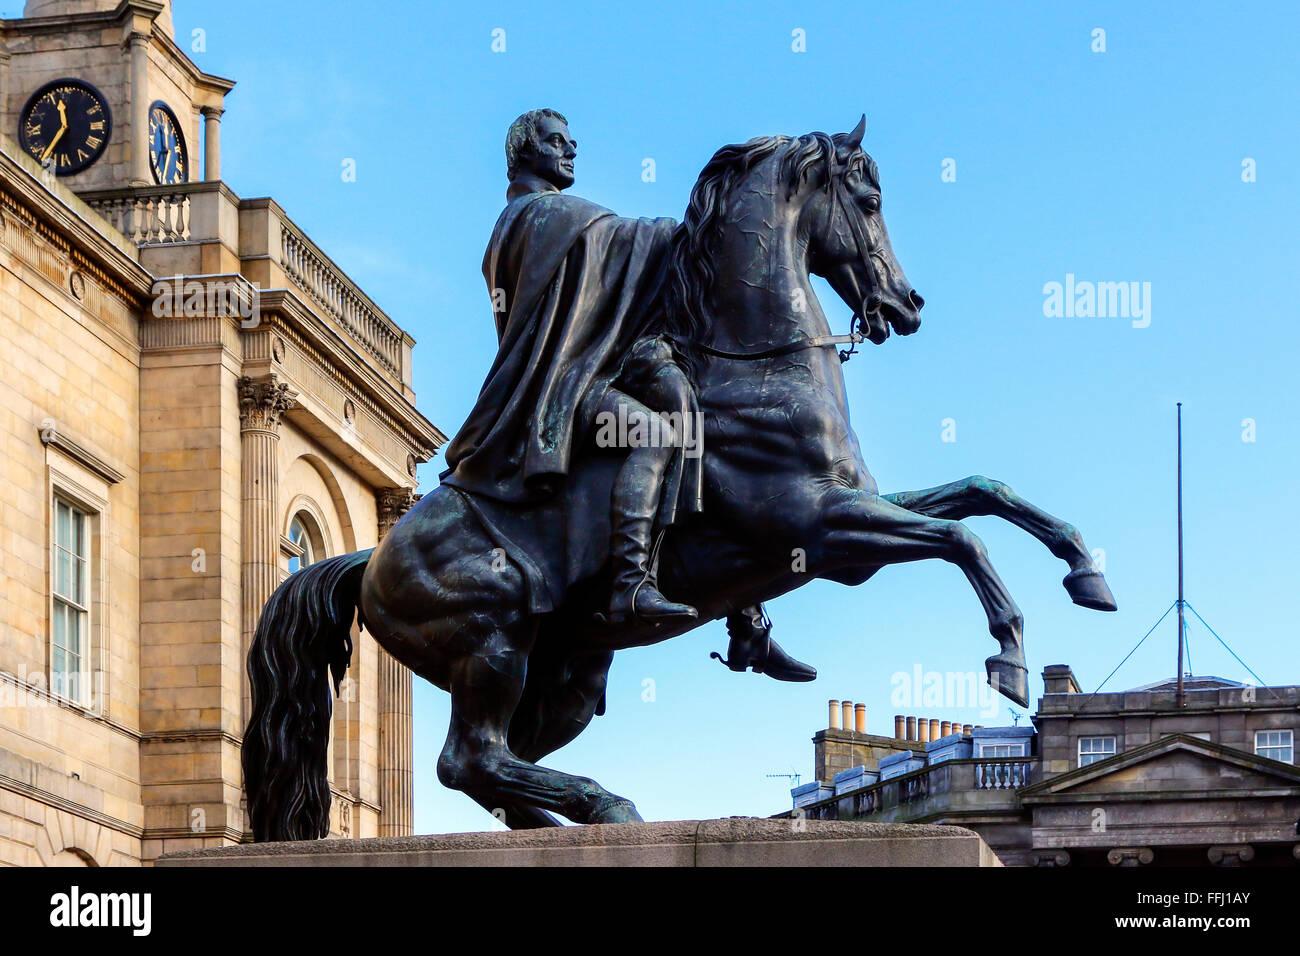 Statue of the Duke of Wellington on  horseback, Princes Street, Edinburgh, Scotland, UK - Stock Image